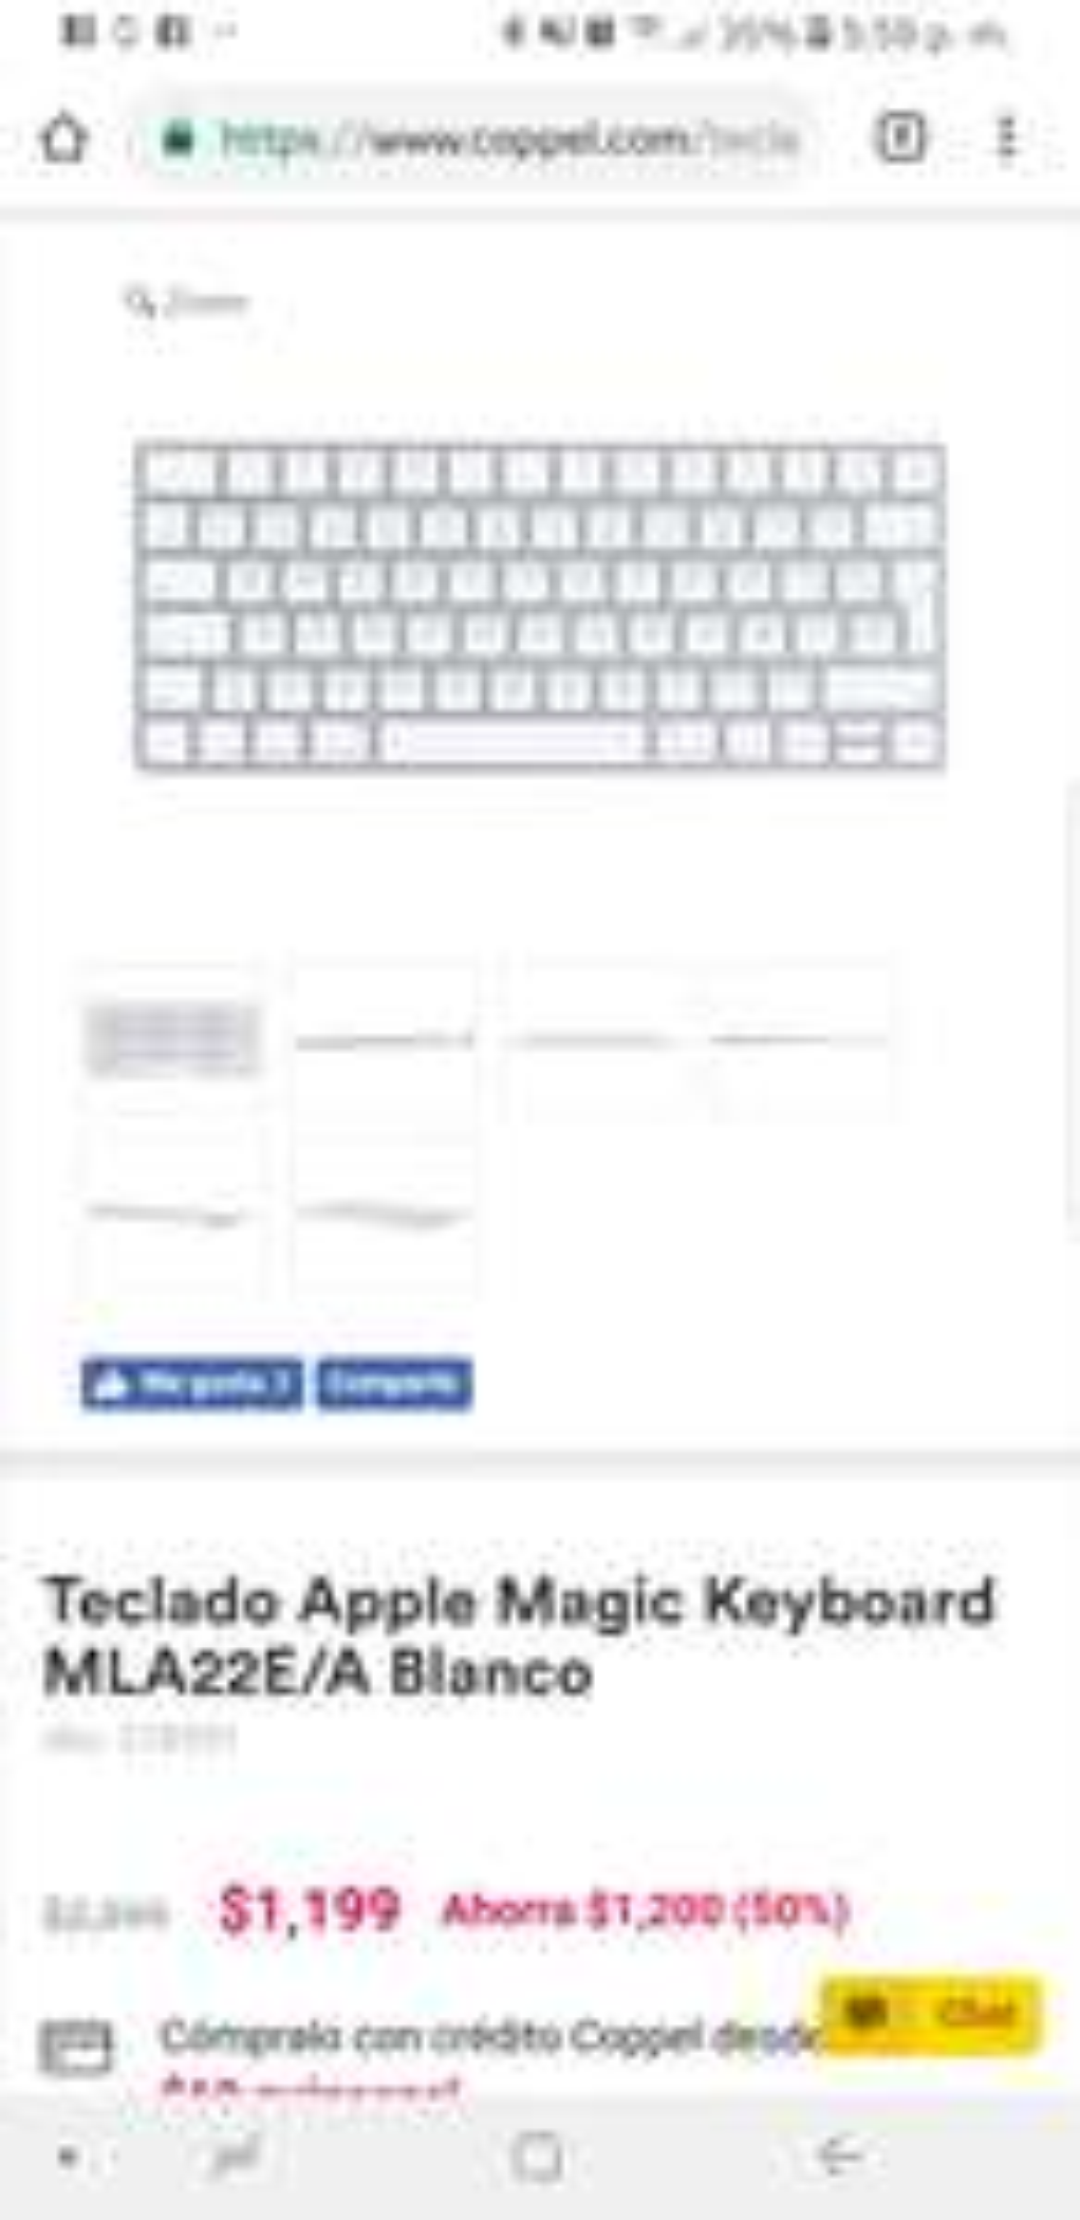 Coppel: Apple Magic keyboard